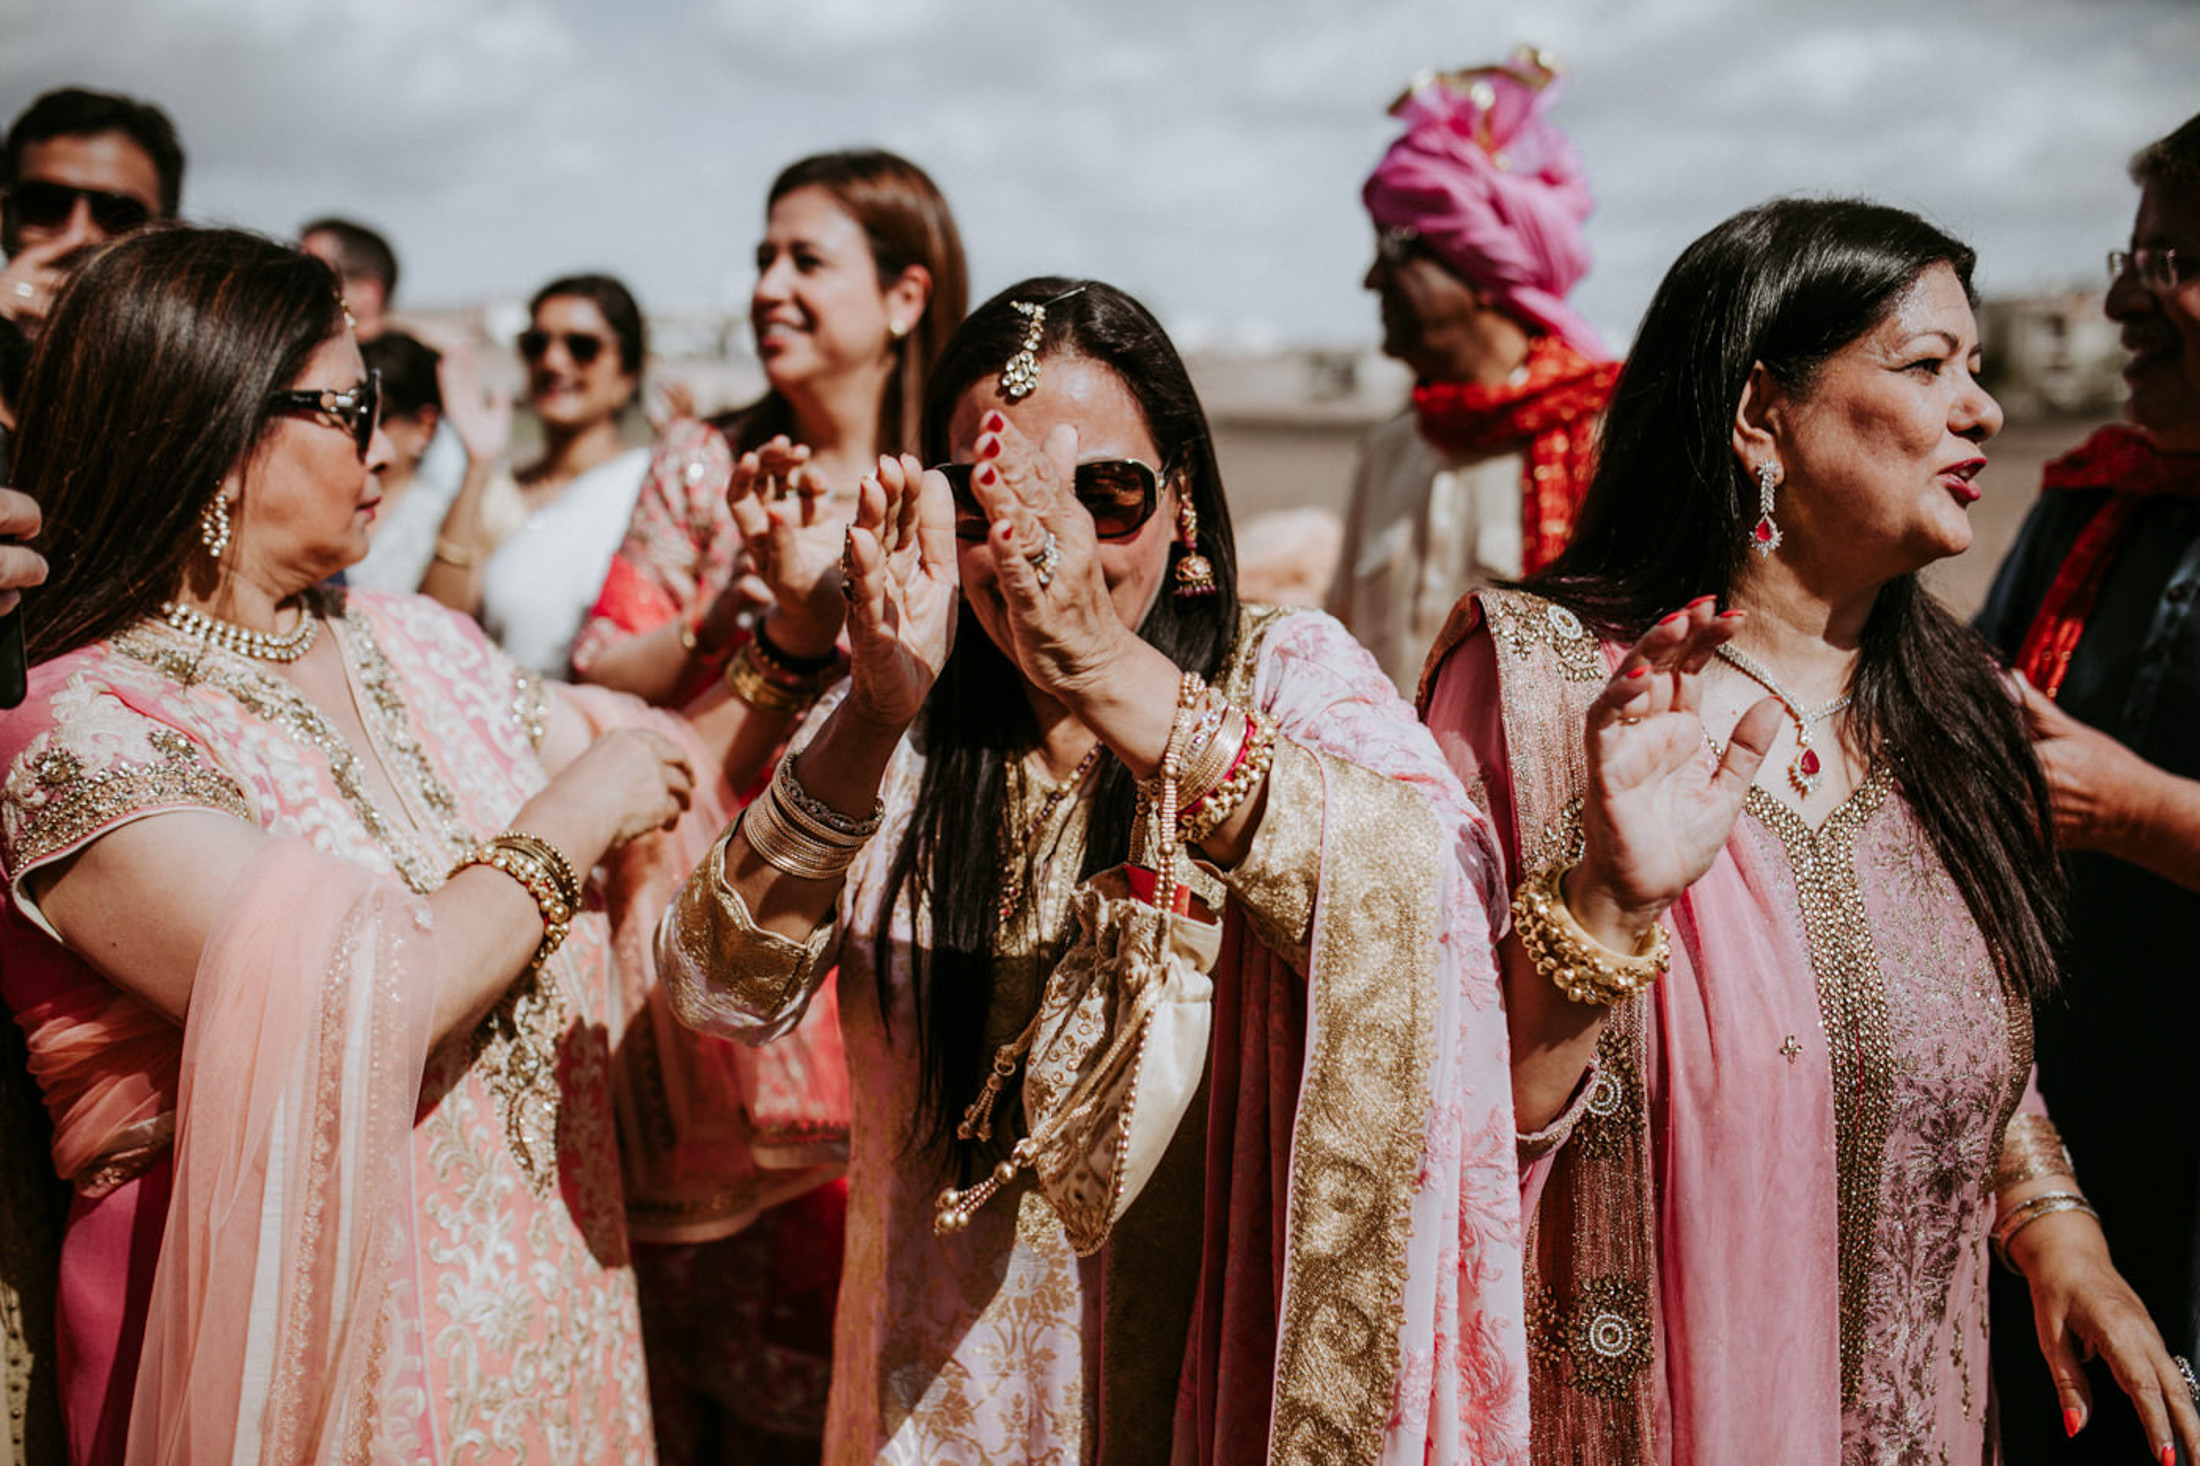 Wedding_Photographer_Mallorca_Daniela-Marquardt_Photography_New_York_Iceland_Tuscany_Santorini_Portugal_Austria_Bavaria_Elopement_Hochzeitsfotograf_AntjeRajat2_31